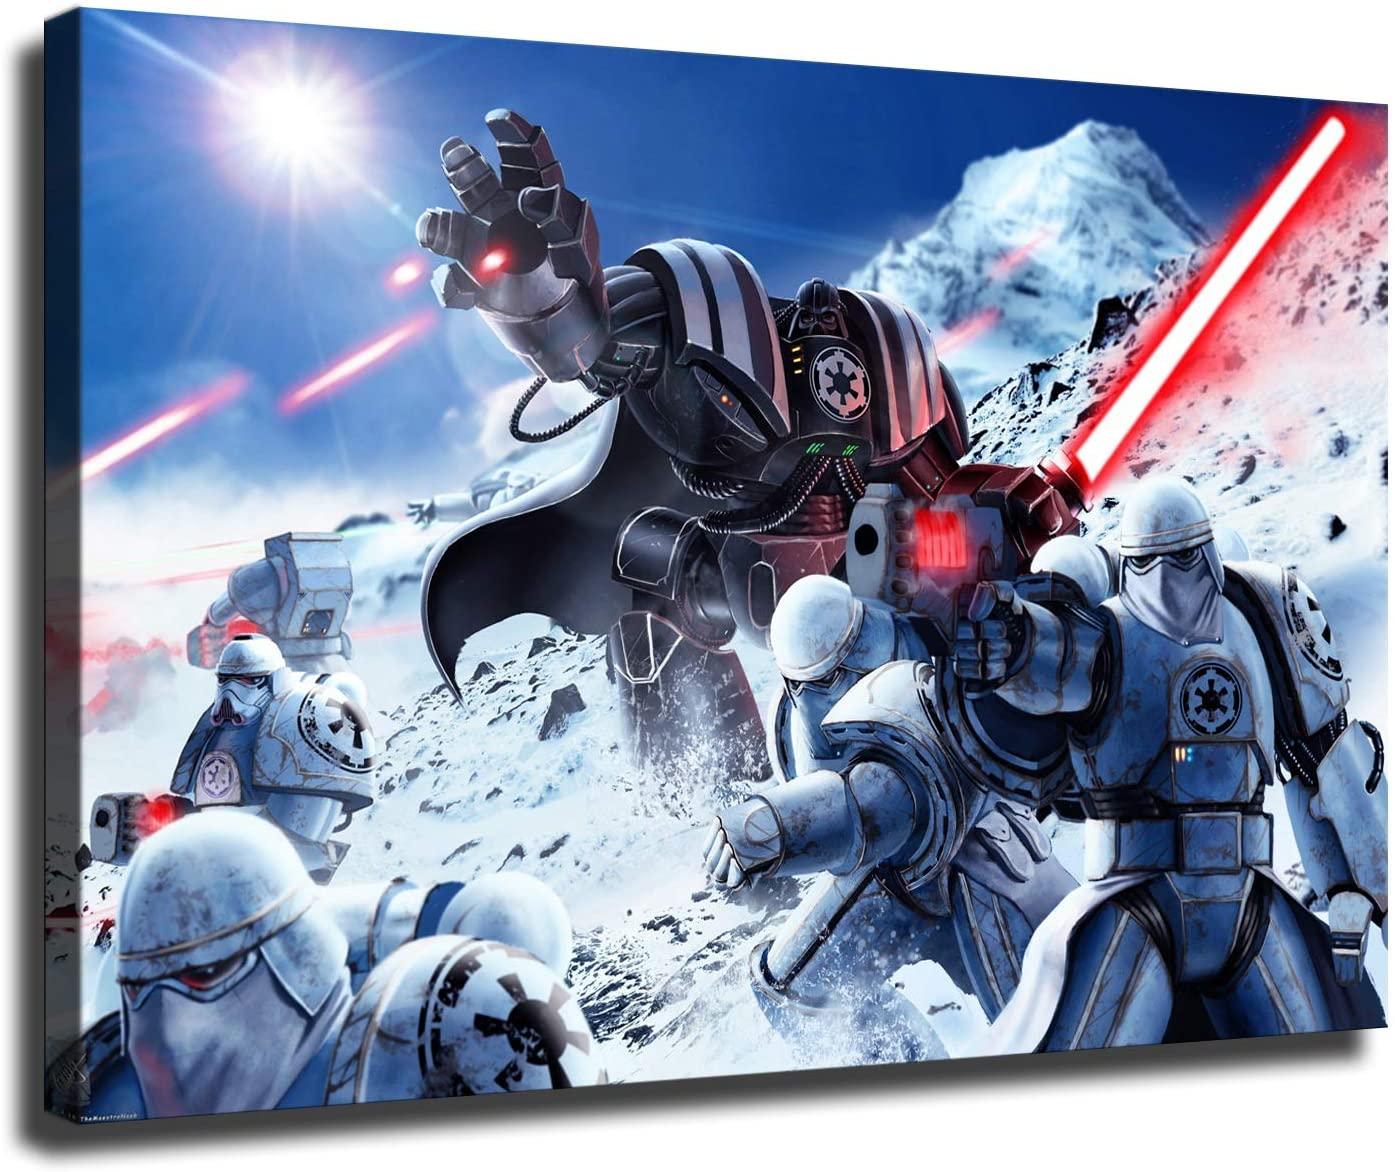 Canvas poster Star Wars Darth Vader Room wall Decoration HD print wall art (12x18inch,No framed)